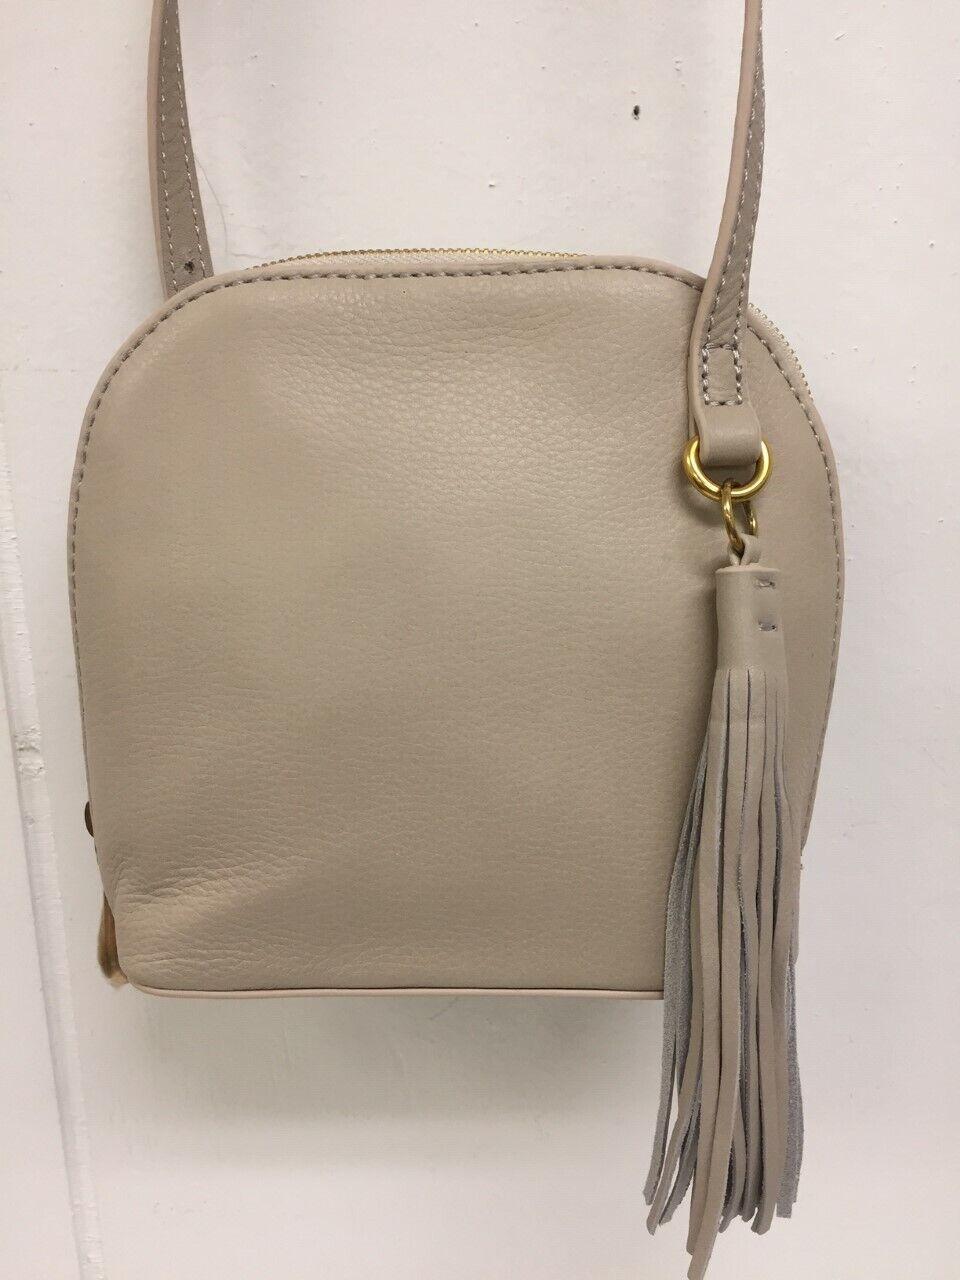 Hobo Bags Genuine Leather Nash Oyster Purse Crossbody Bag Ne